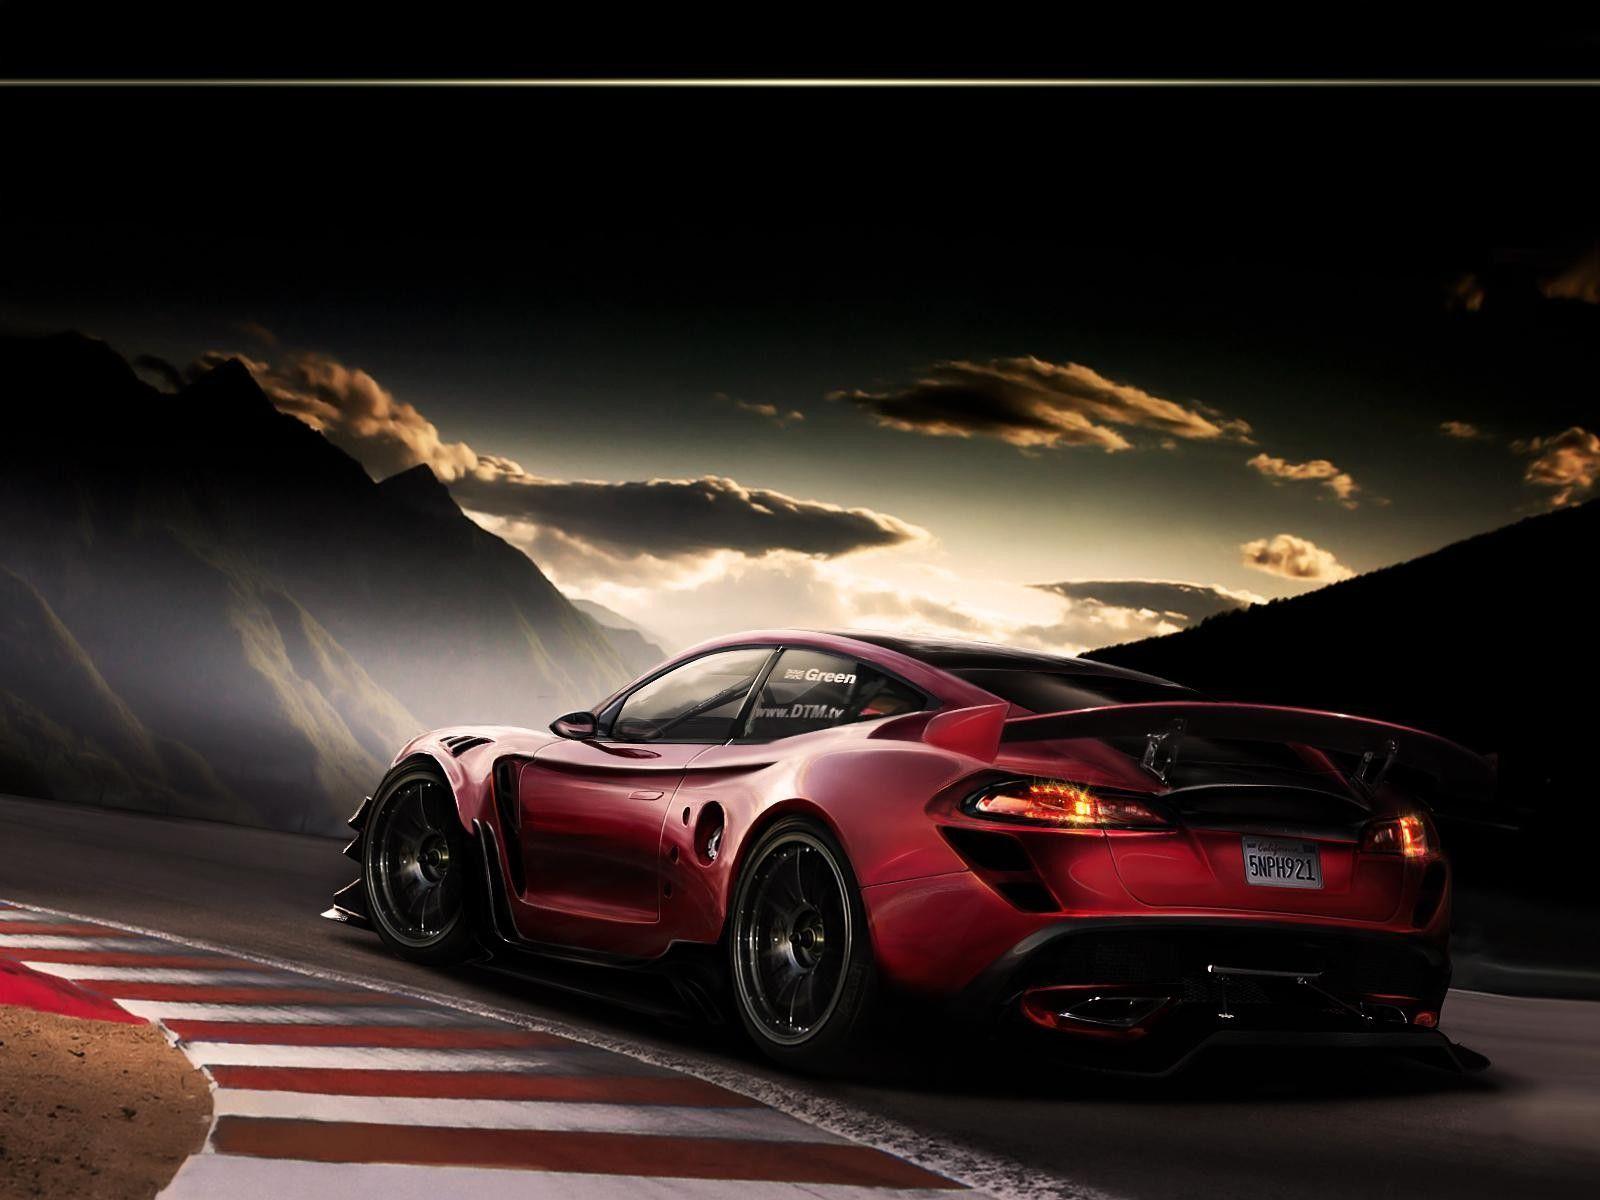 Coolredsportscar  Cars  Pinterest  Cars Car images and